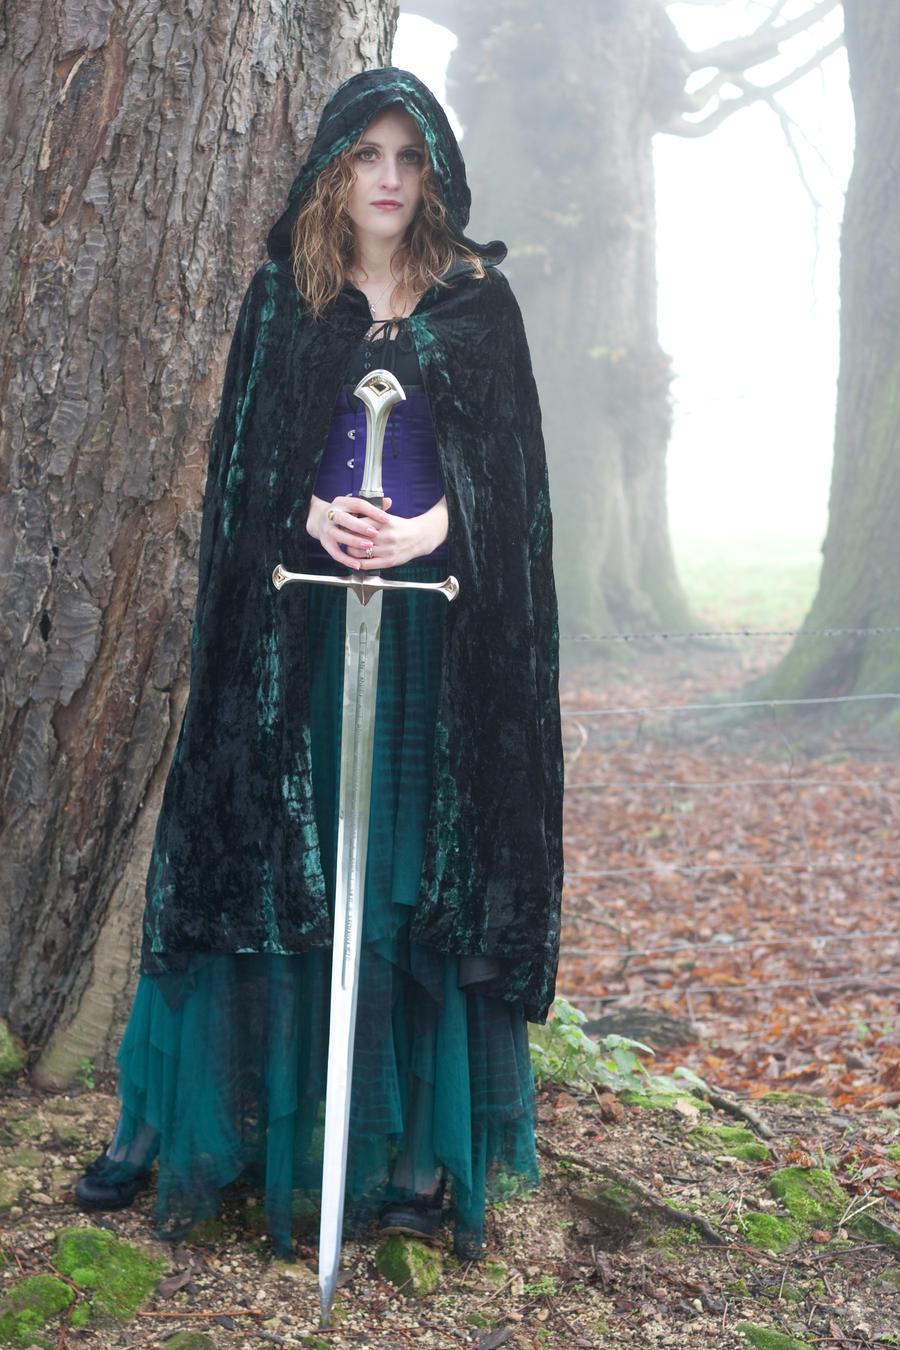 [Image: woman_with_sword_6_by_lughofthelongarm-d33g240.jpg]